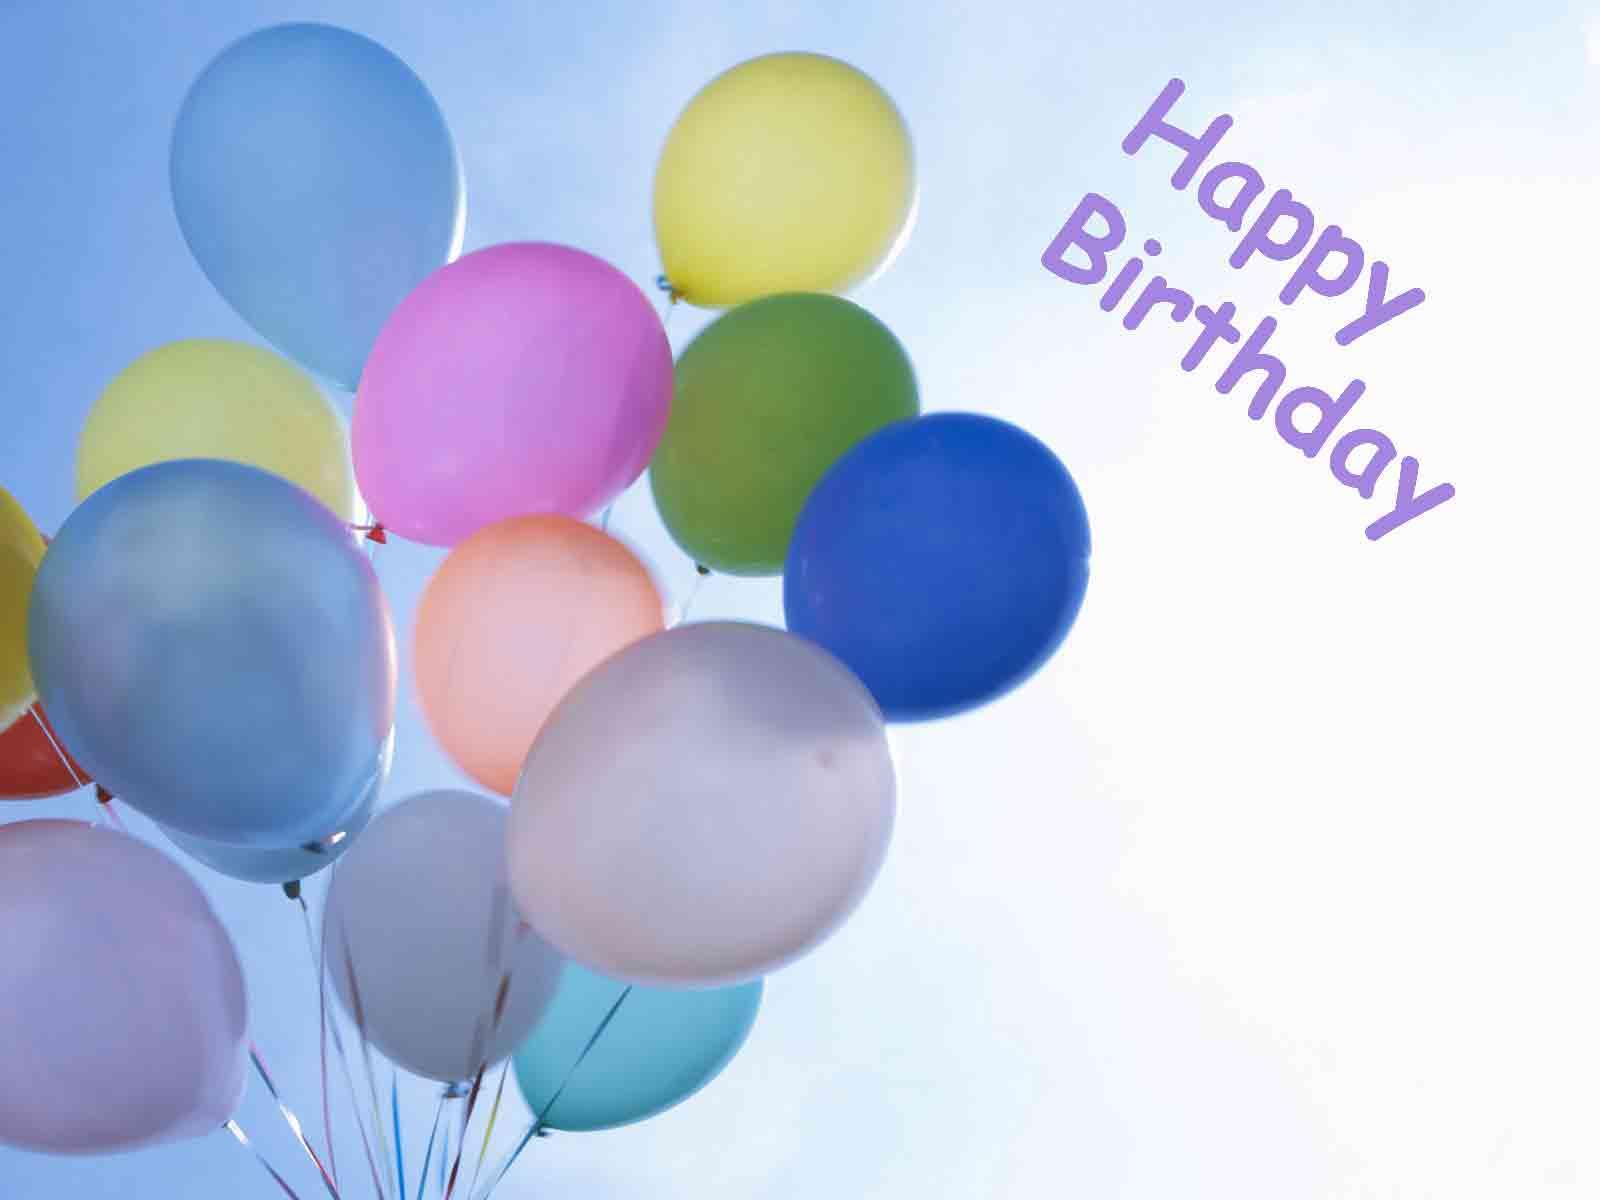 http://3.bp.blogspot.com/-Pp3qf_CFCHg/UUXsEHEZryI/AAAAAAABMl4/0KCxg1pU9Y0/s1600/hinh+nen+sinh+nhat,+happy+birthday+wallpaper+(8).jpg